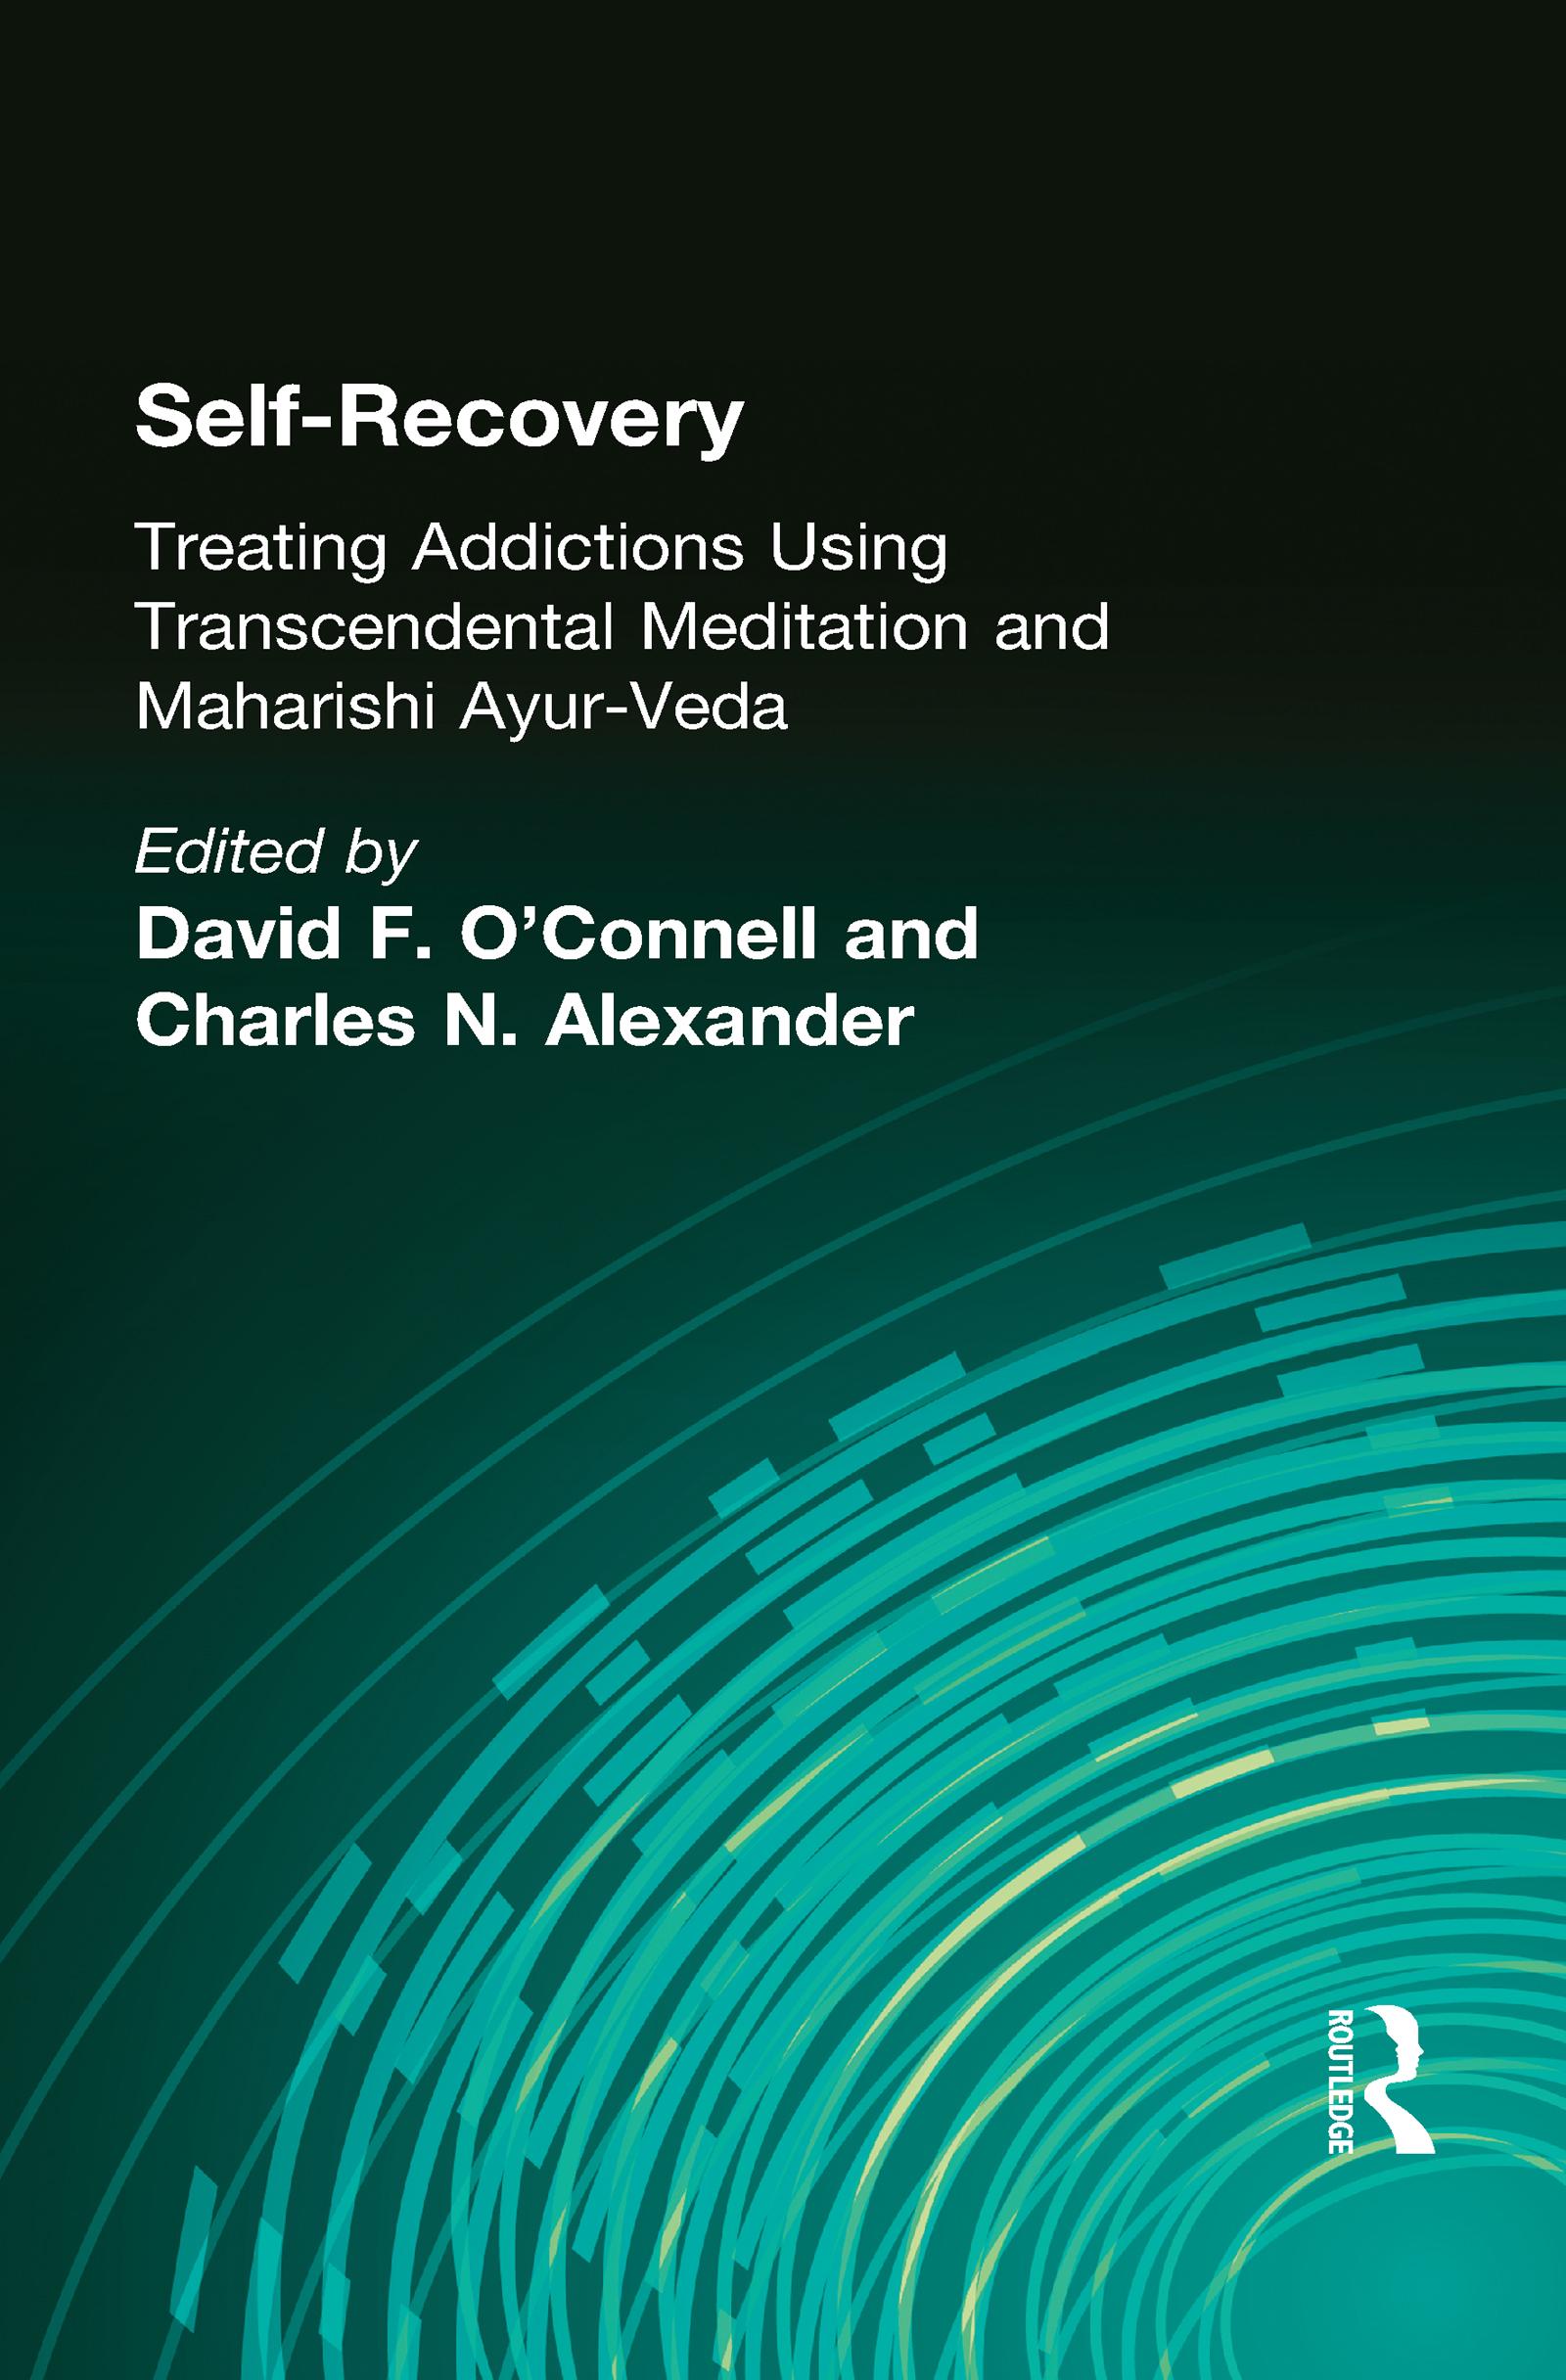 Self-Recovery: Treating Addictions Using Transcendental Meditation and Maharishi Ayur-Veda, 1st Edition (Hardback) book cover